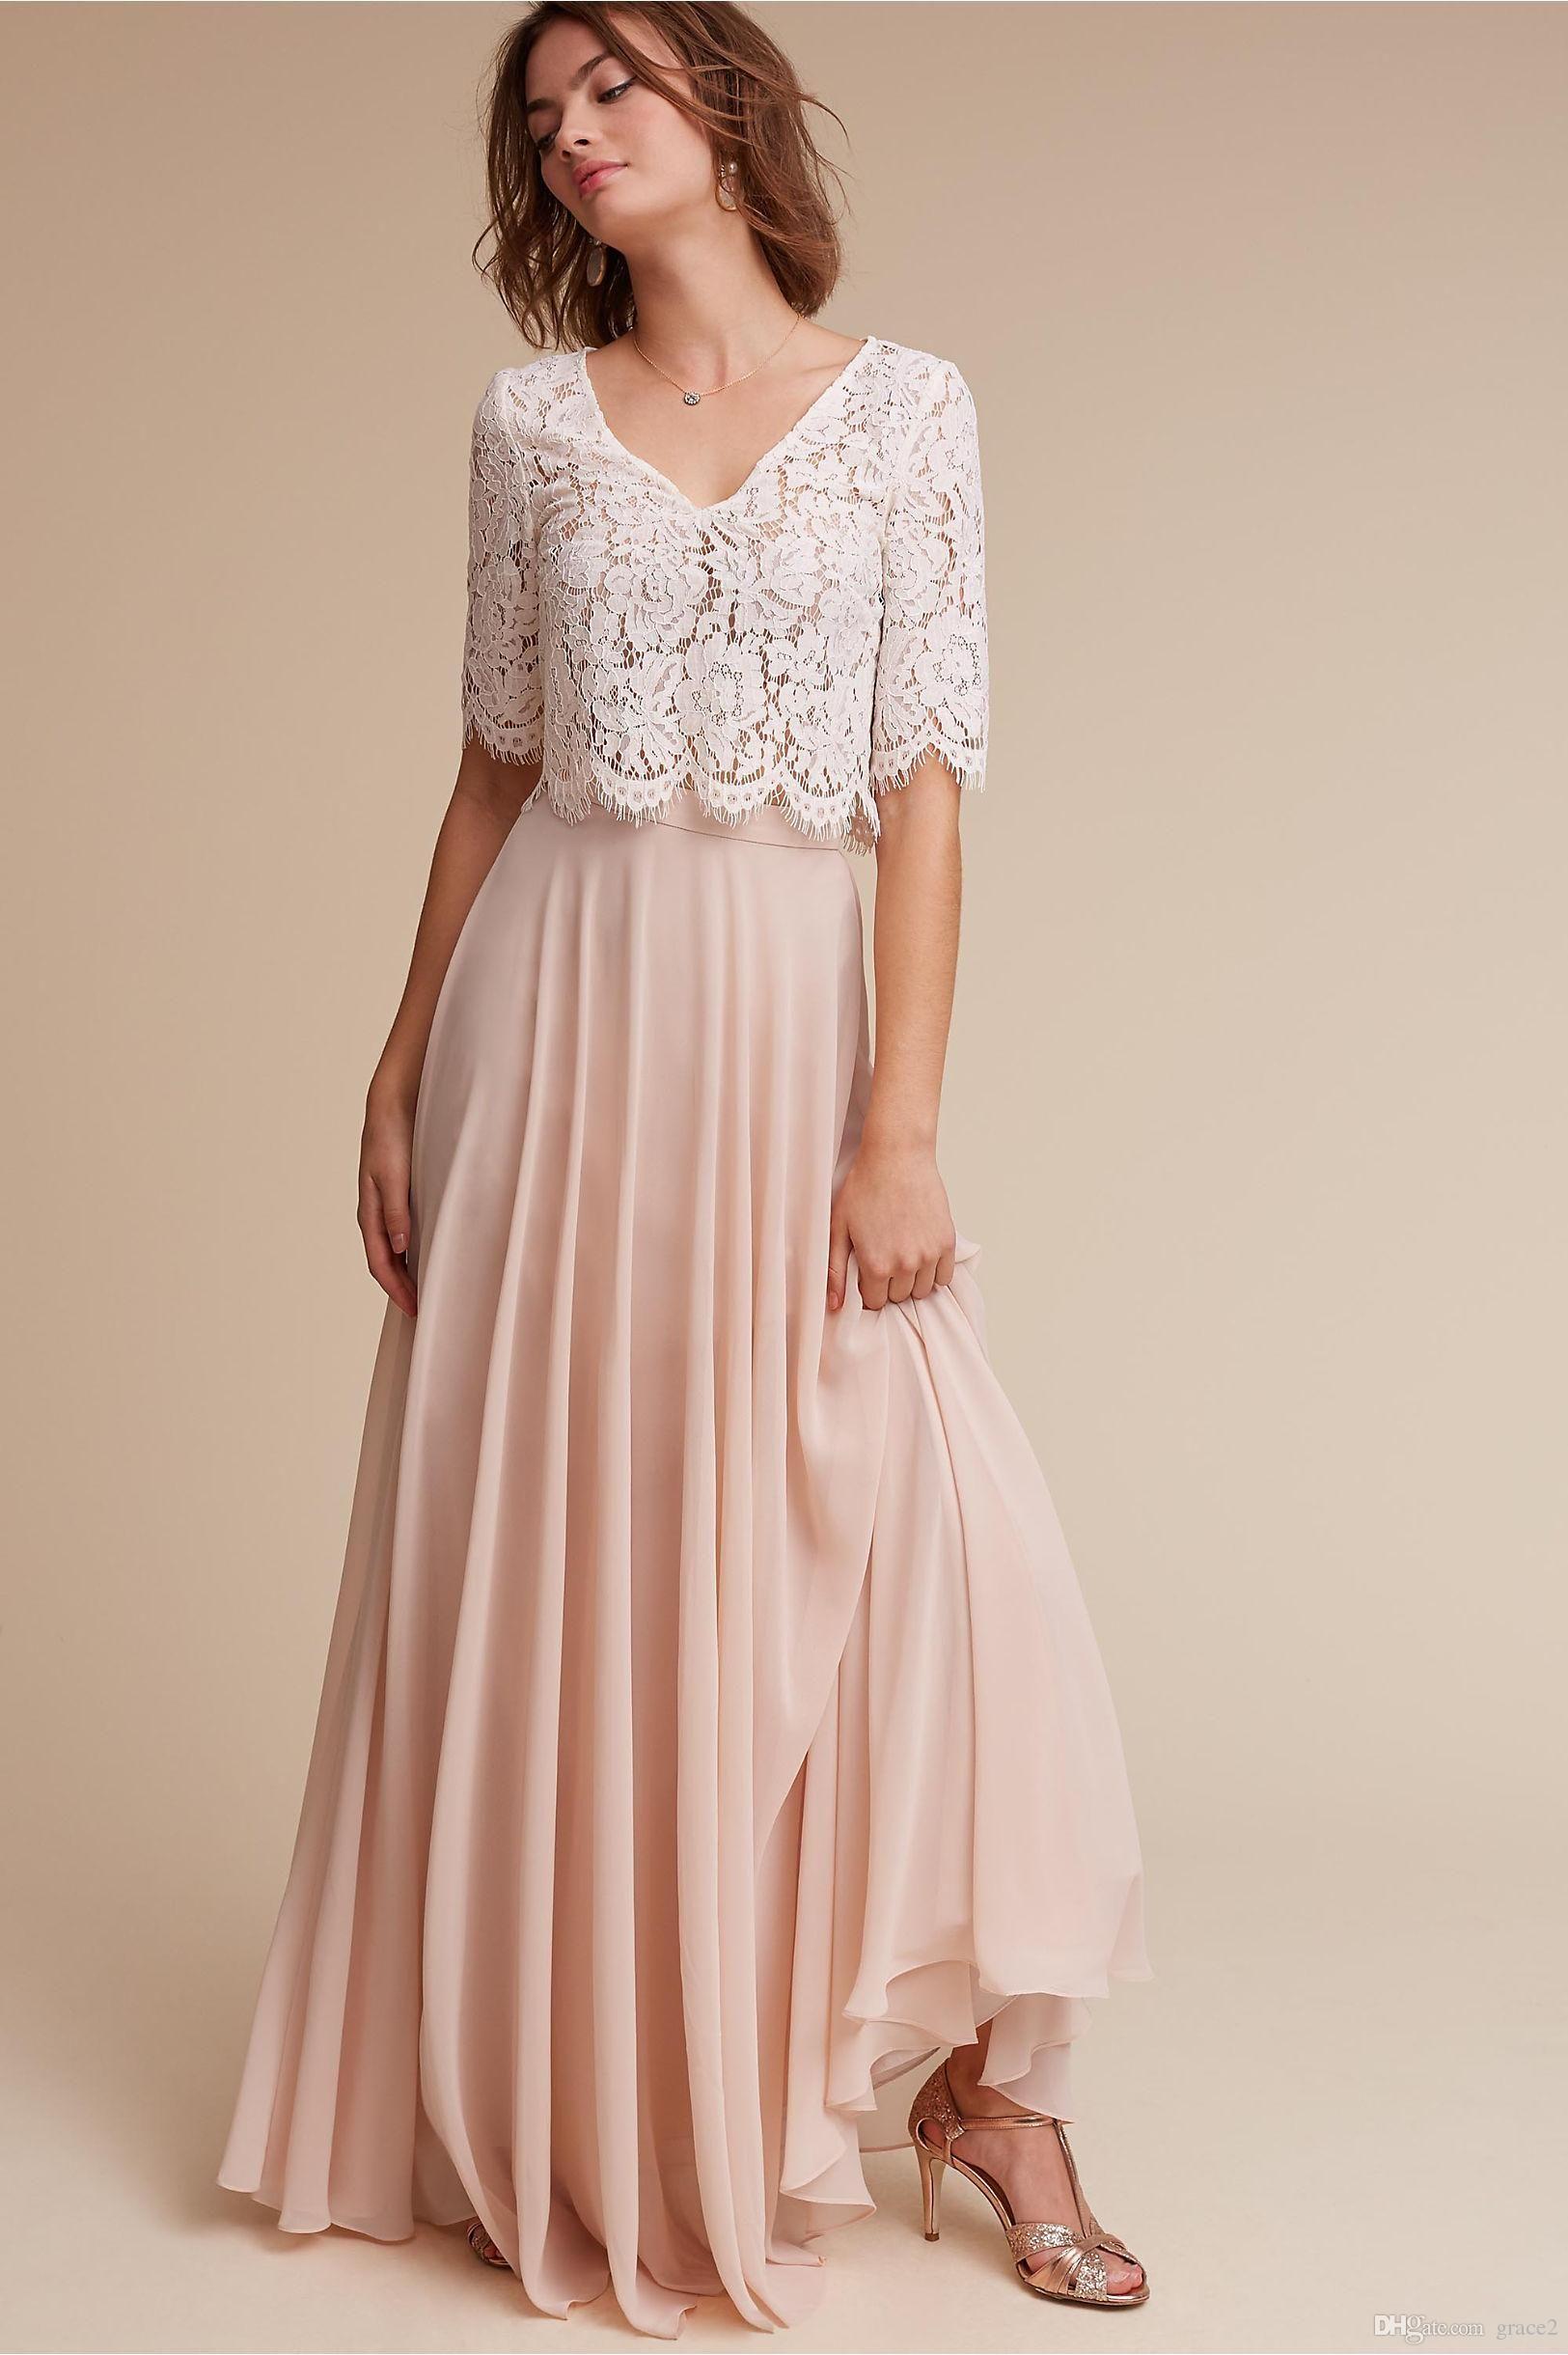 Lace u chiffon bridesmaid dresses bhldn under with half